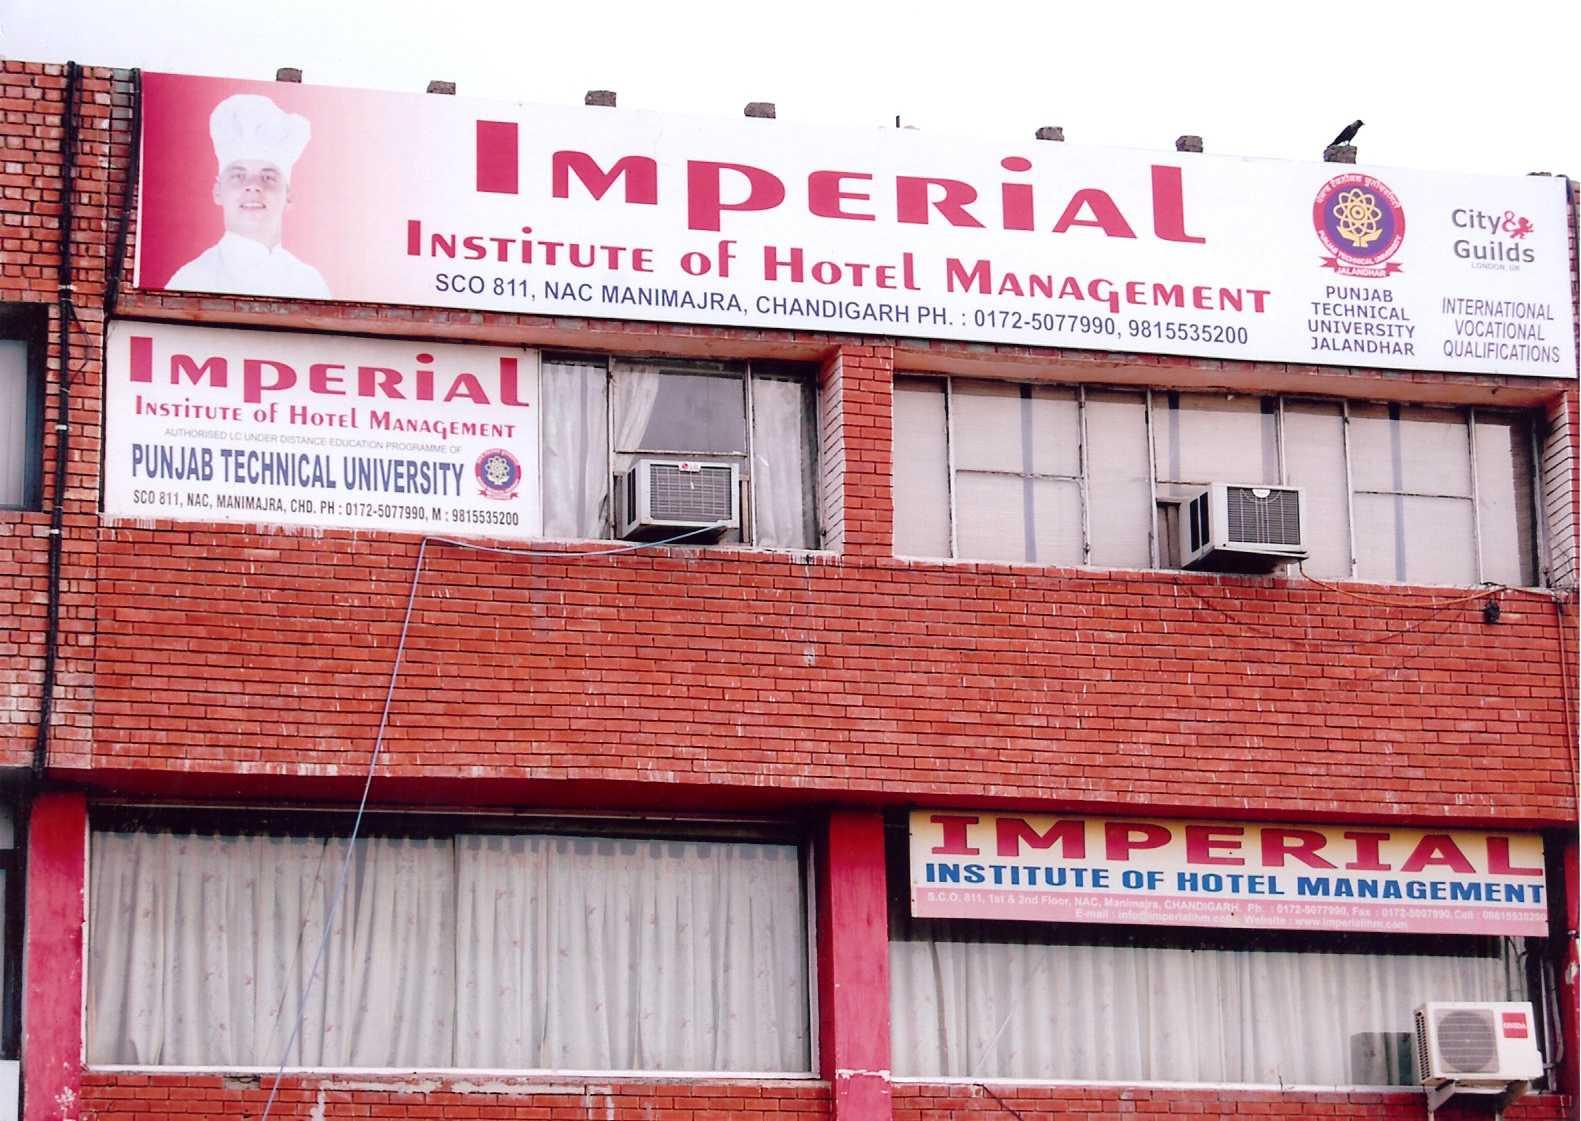 Imperial Institute of Hotel Management, Chandigarh